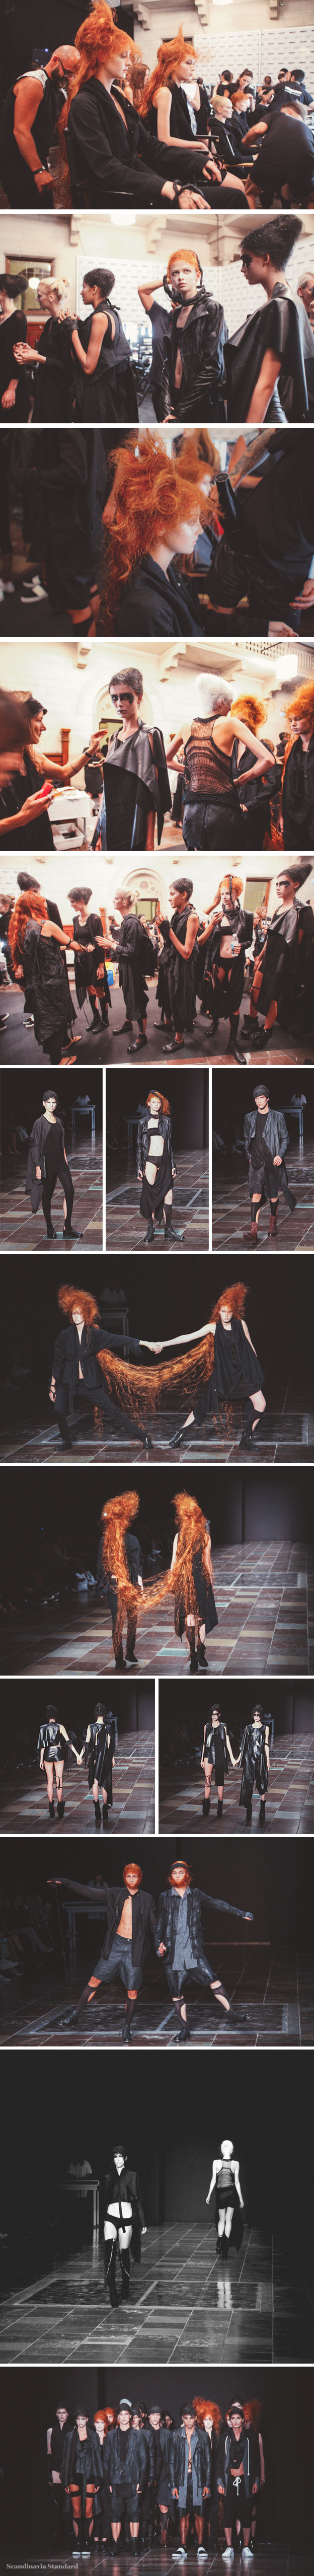 Barbara i Gongini Collage of Looks | Scandinavia Standard 2